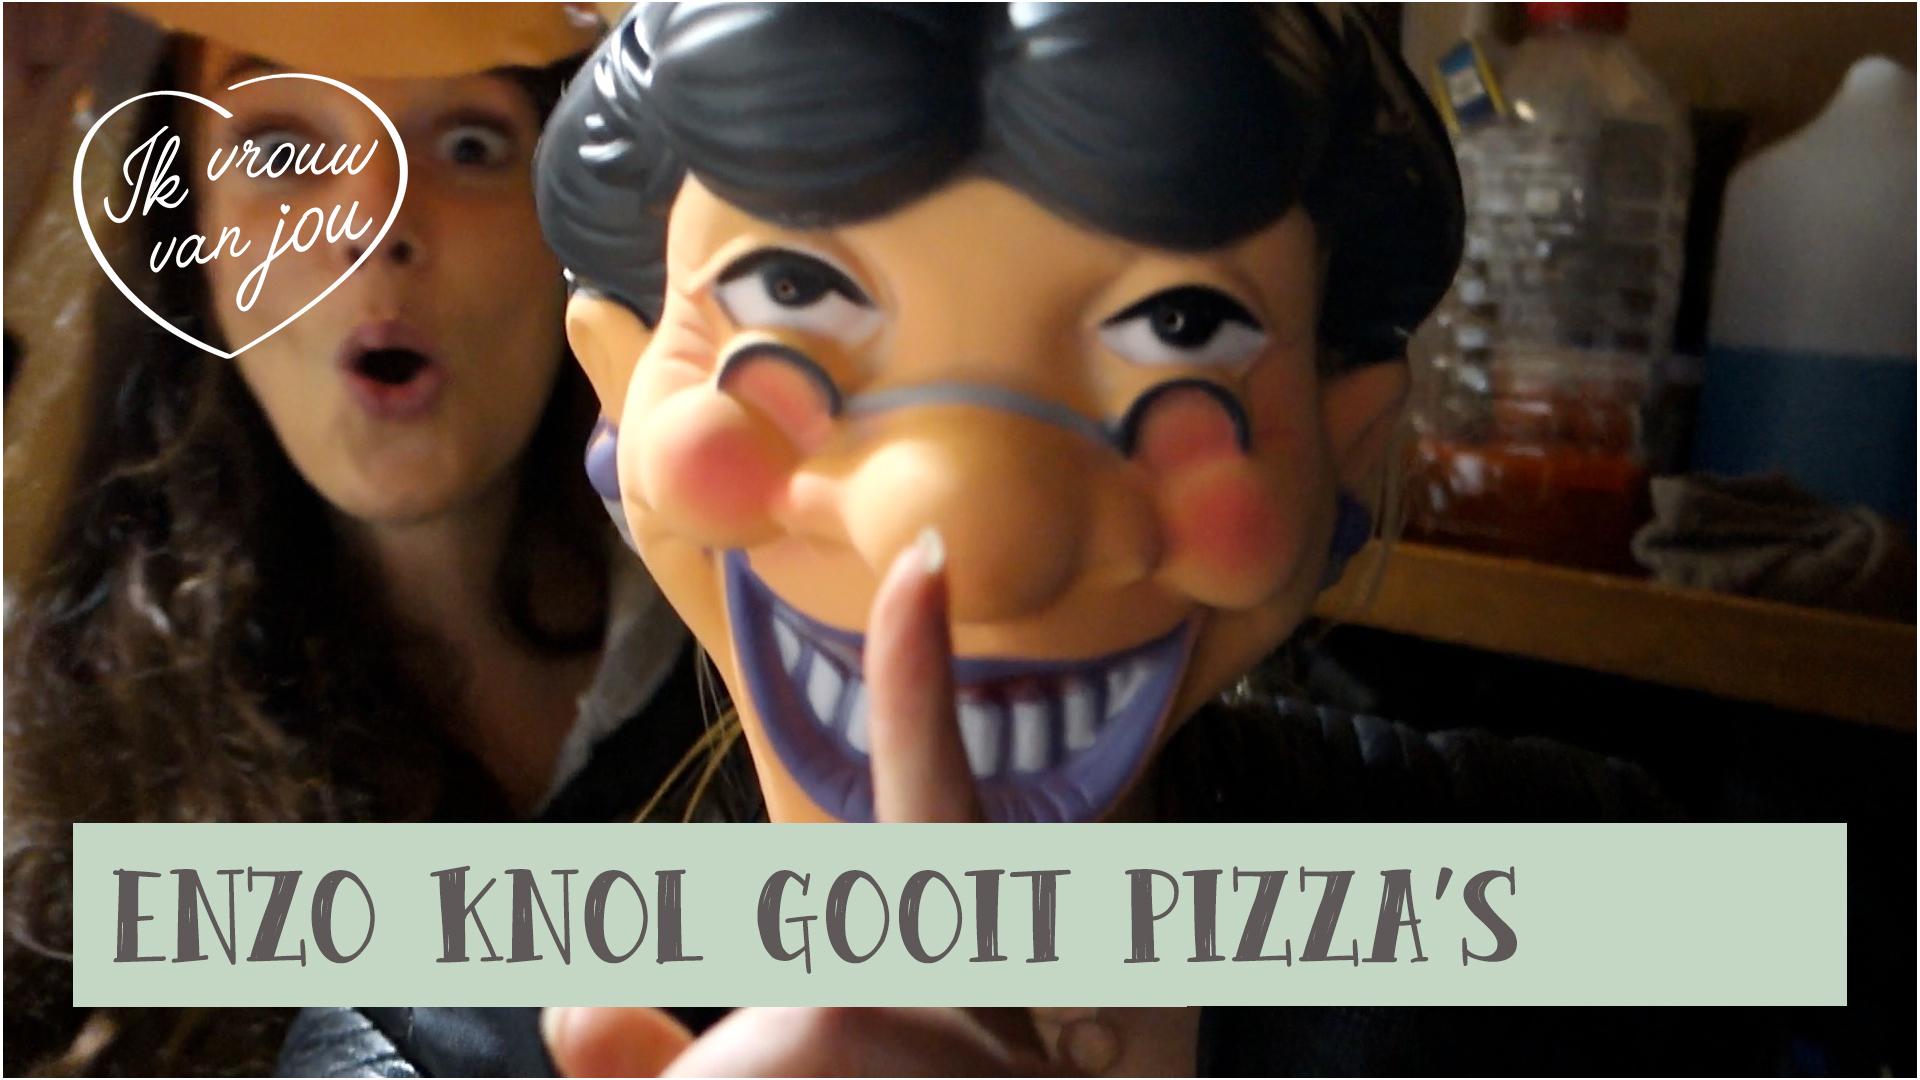 enzo knol gooit pizza's